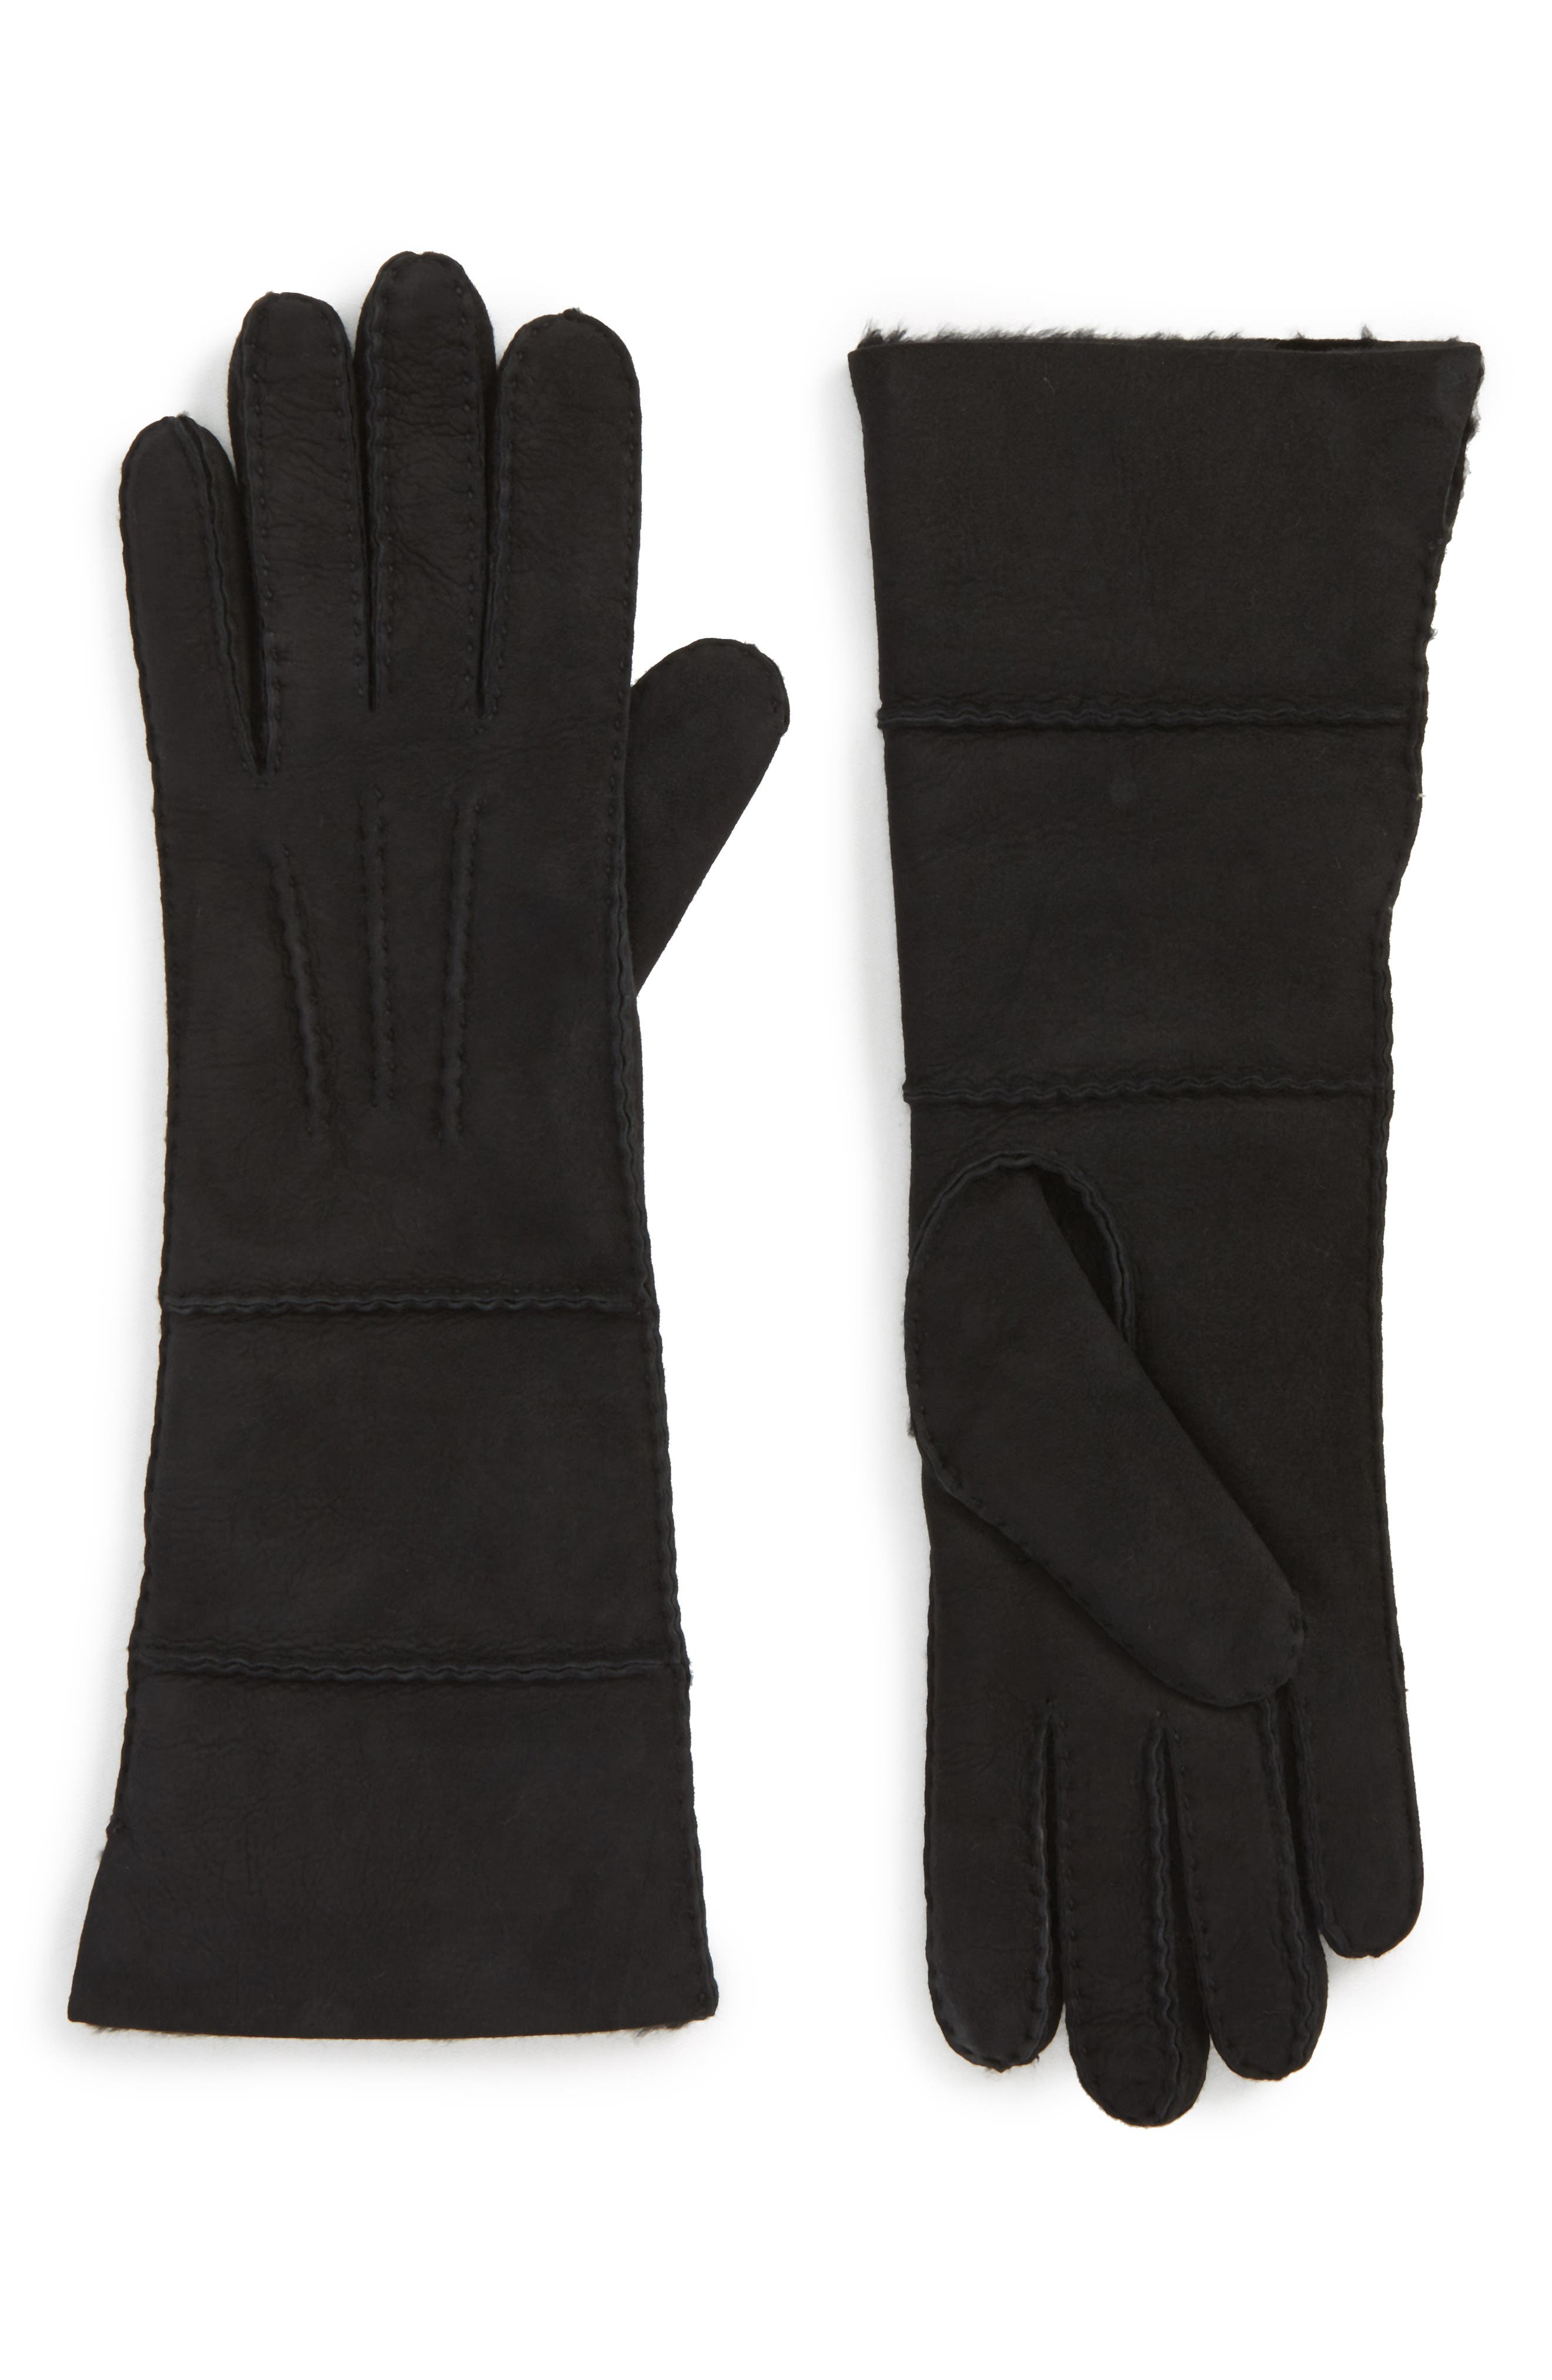 UGG<sup>®</sup> Long Slim Genuine Shearling Gloves,                             Main thumbnail 1, color,                             Black